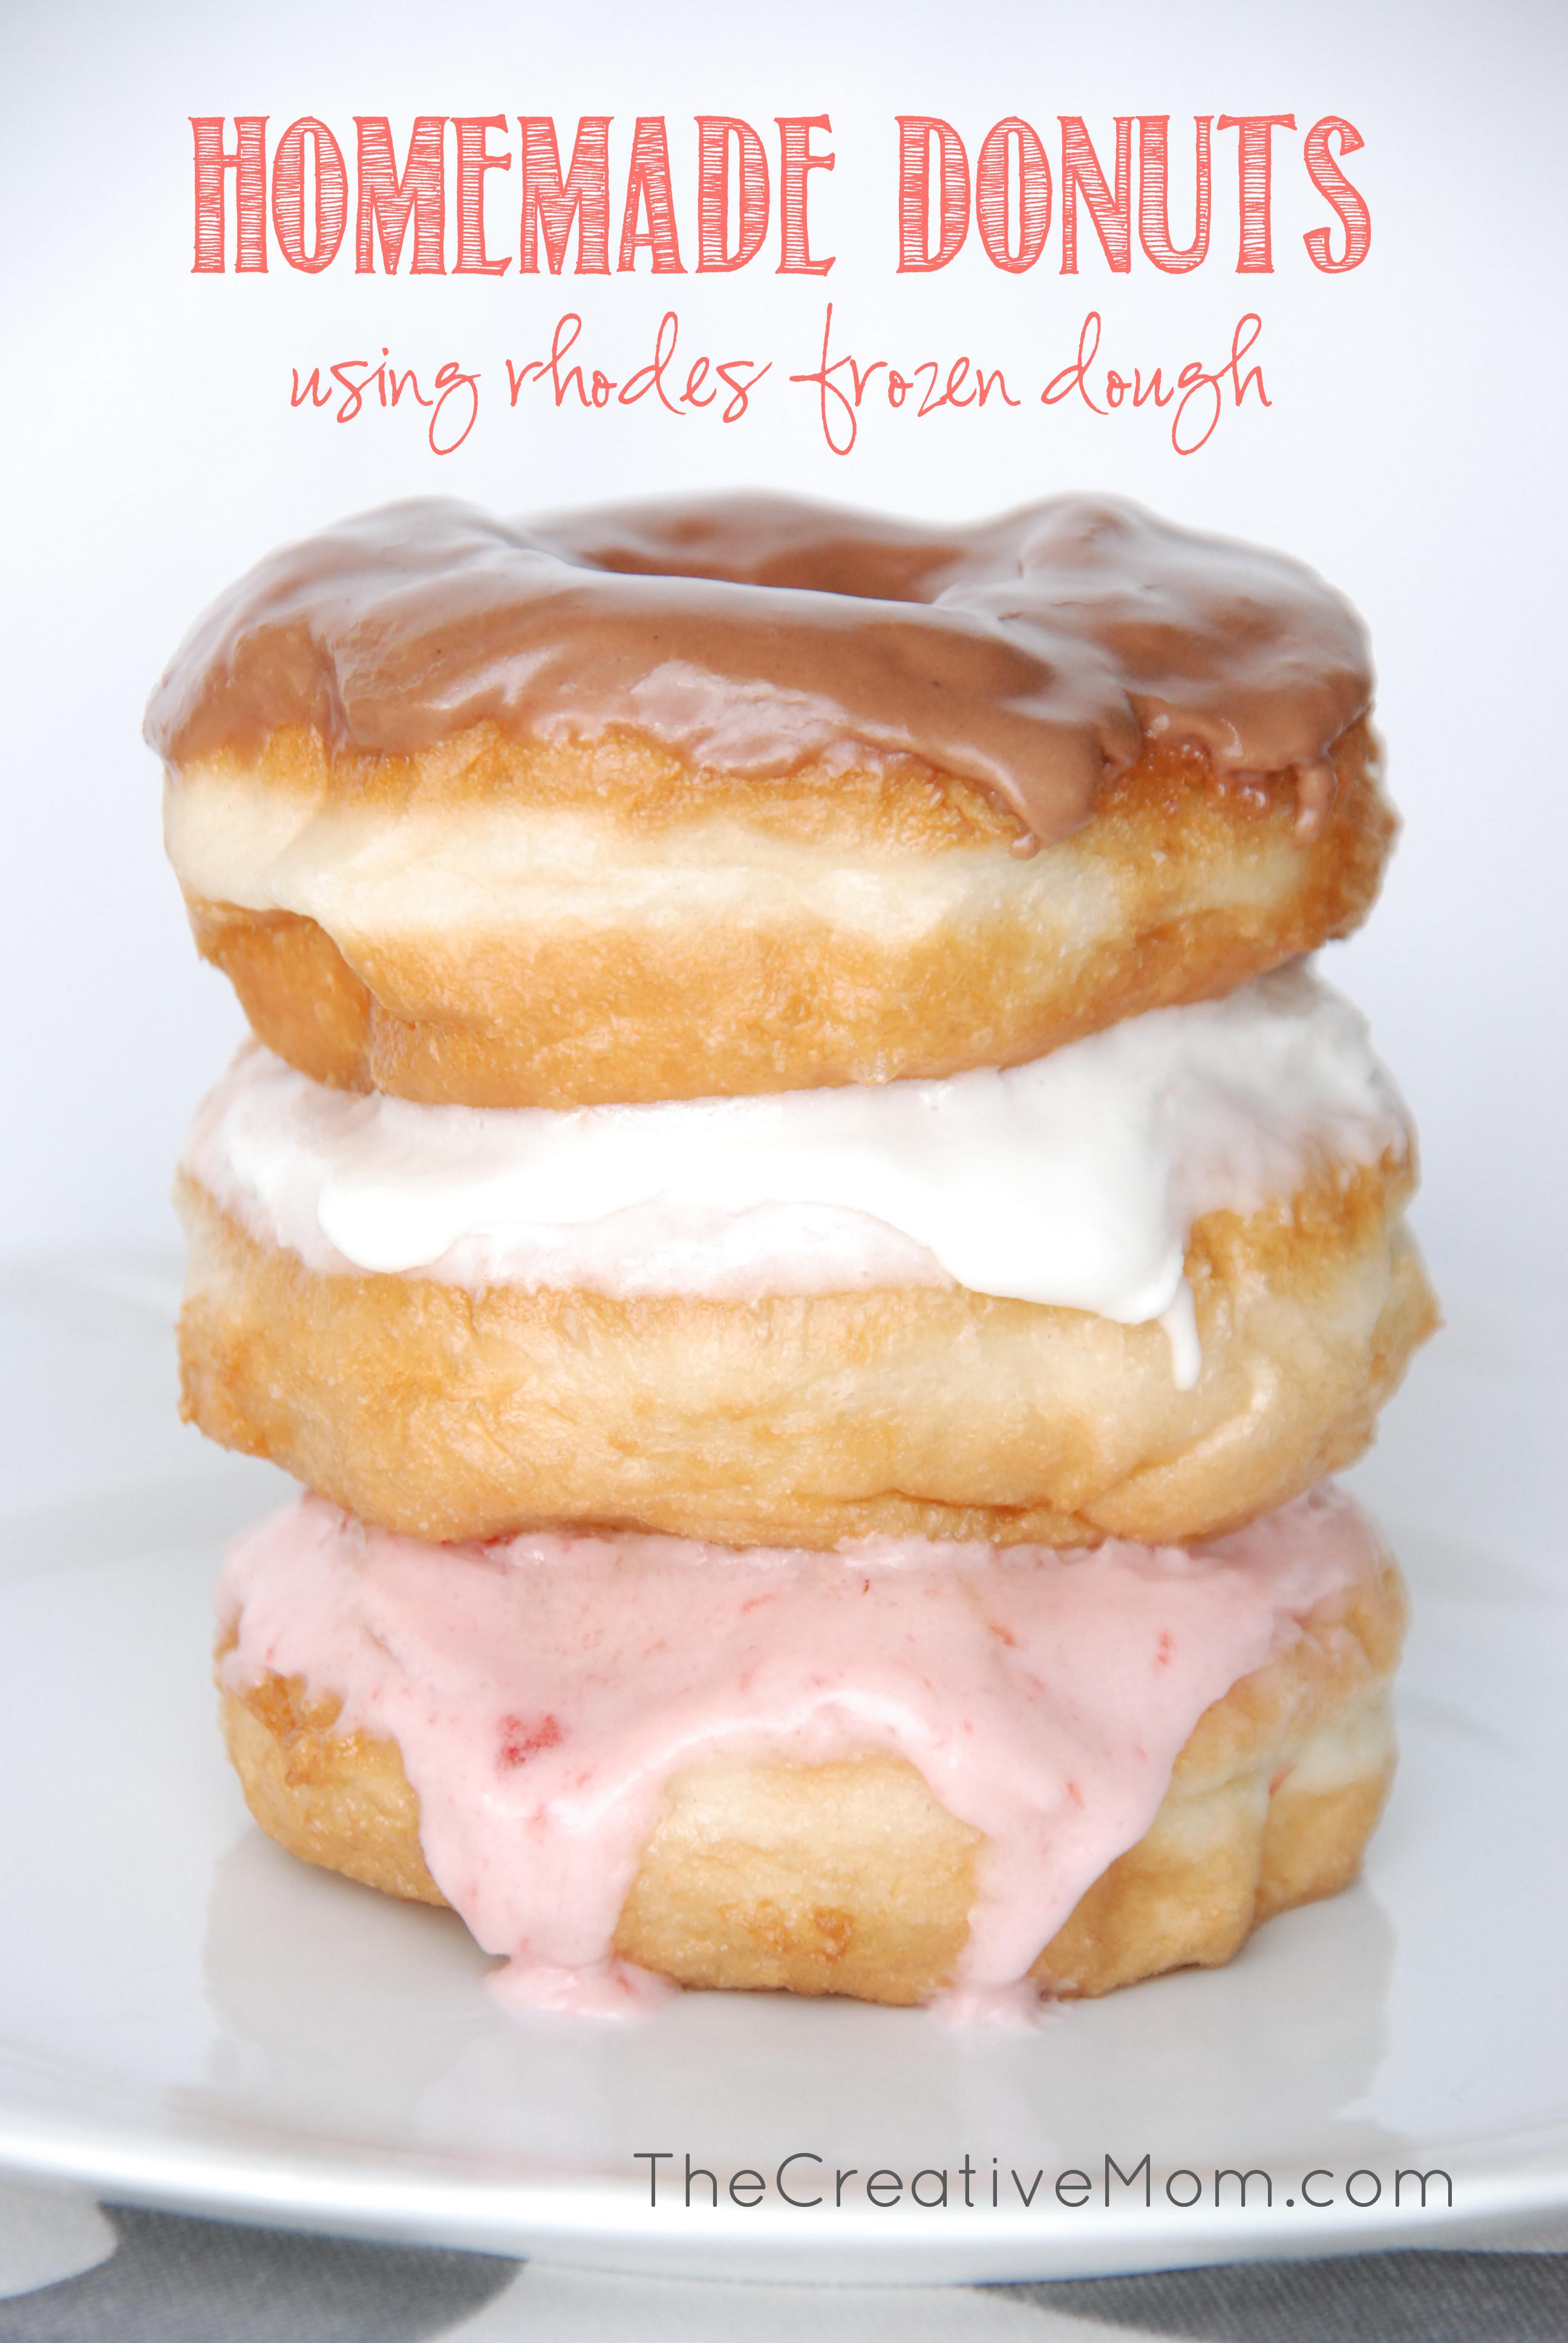 Homemade Donuts Using Rhodes Frozen Dough The Creative Mom